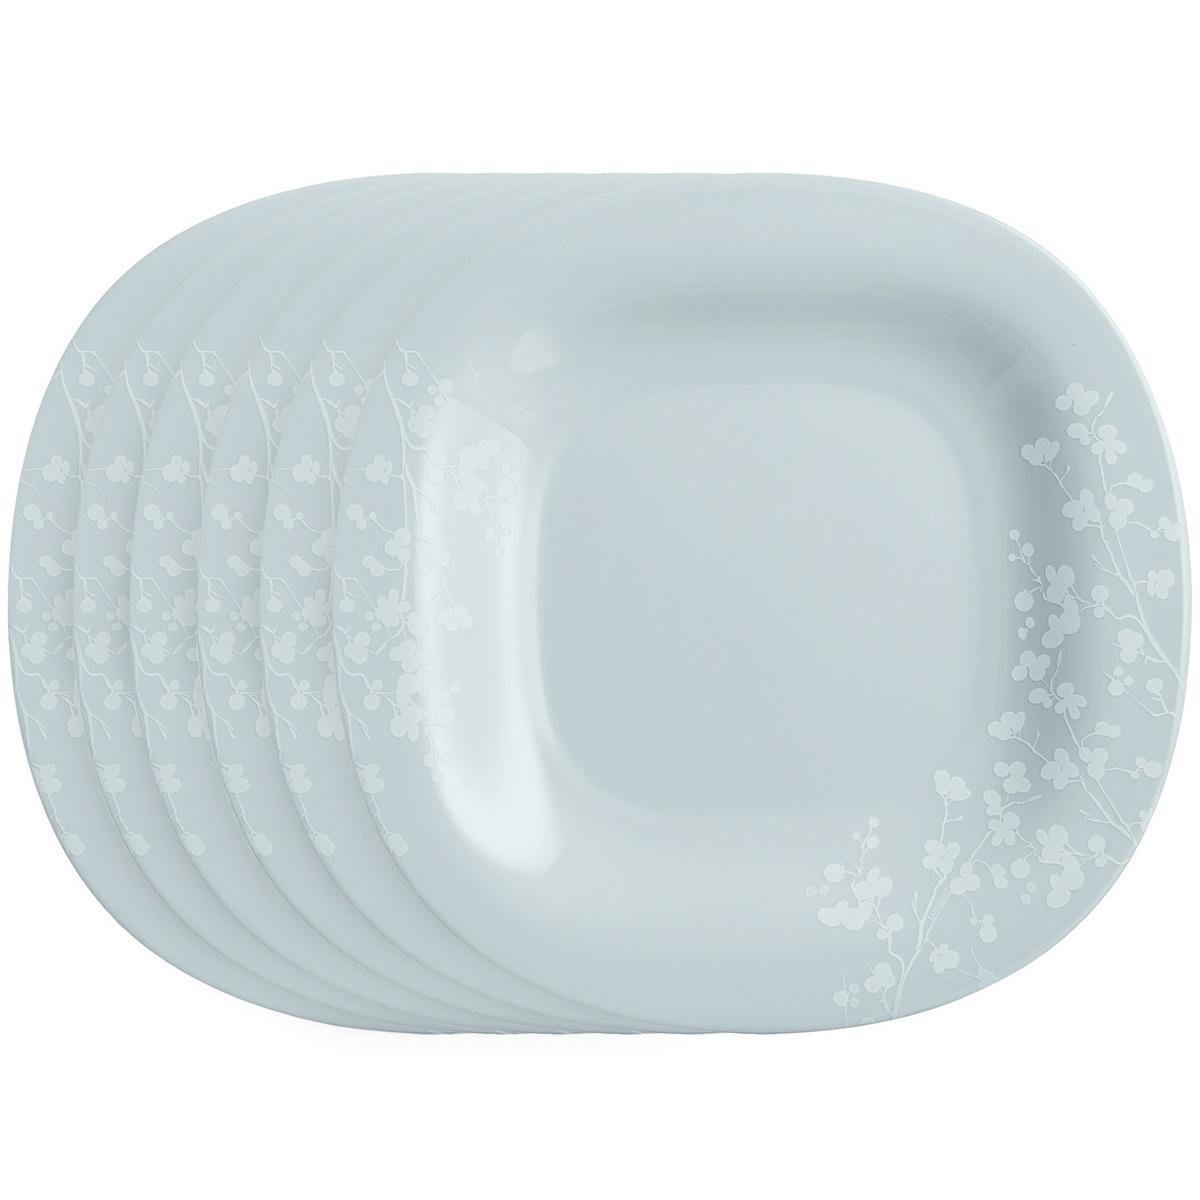 Luminarc Sada mělkých talířů Ombrelle 27 cm, 6 ks, šedá